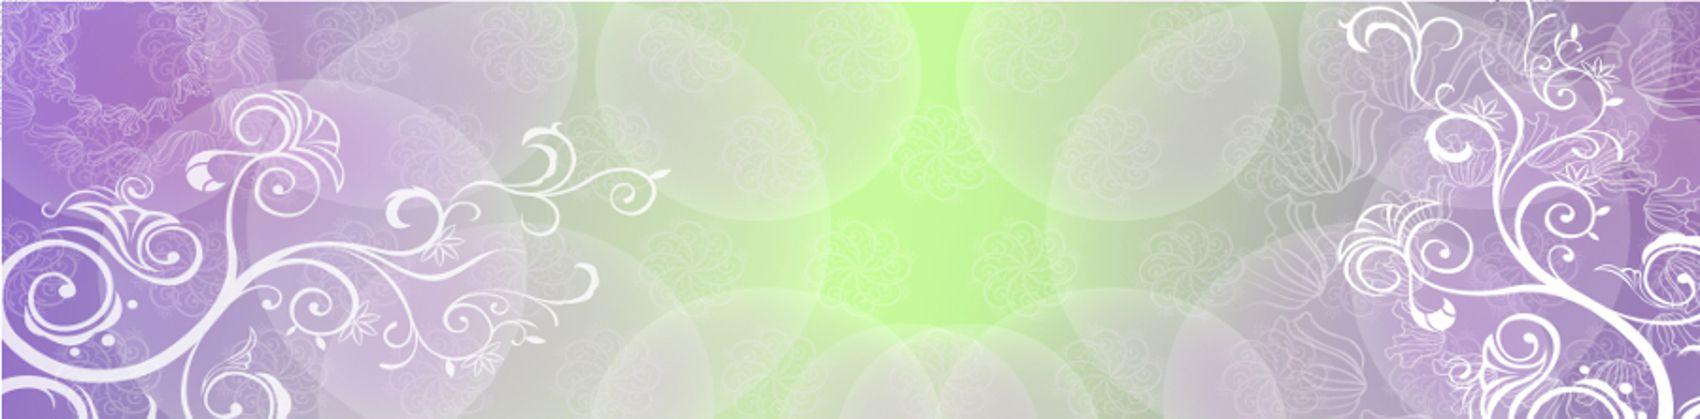 орнамент на зелено-фиолетовом фоне